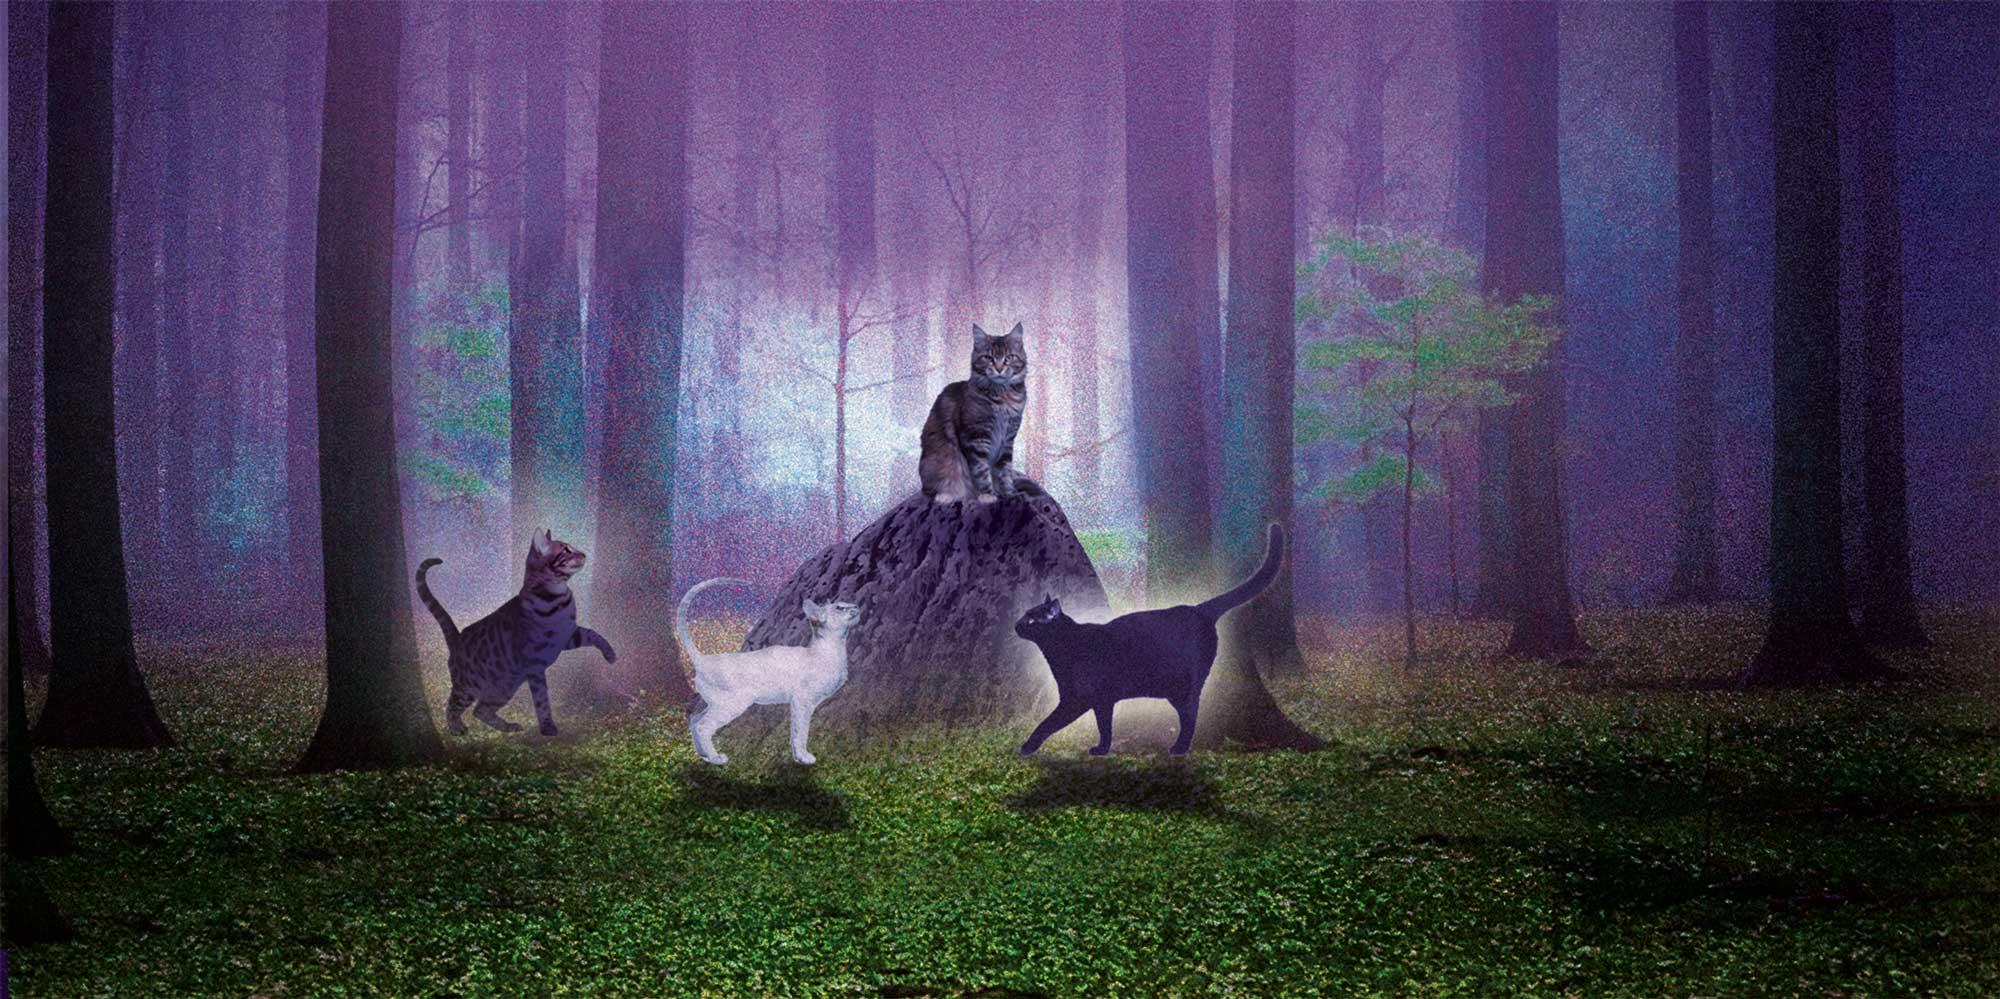 Staffel Warrior Cats